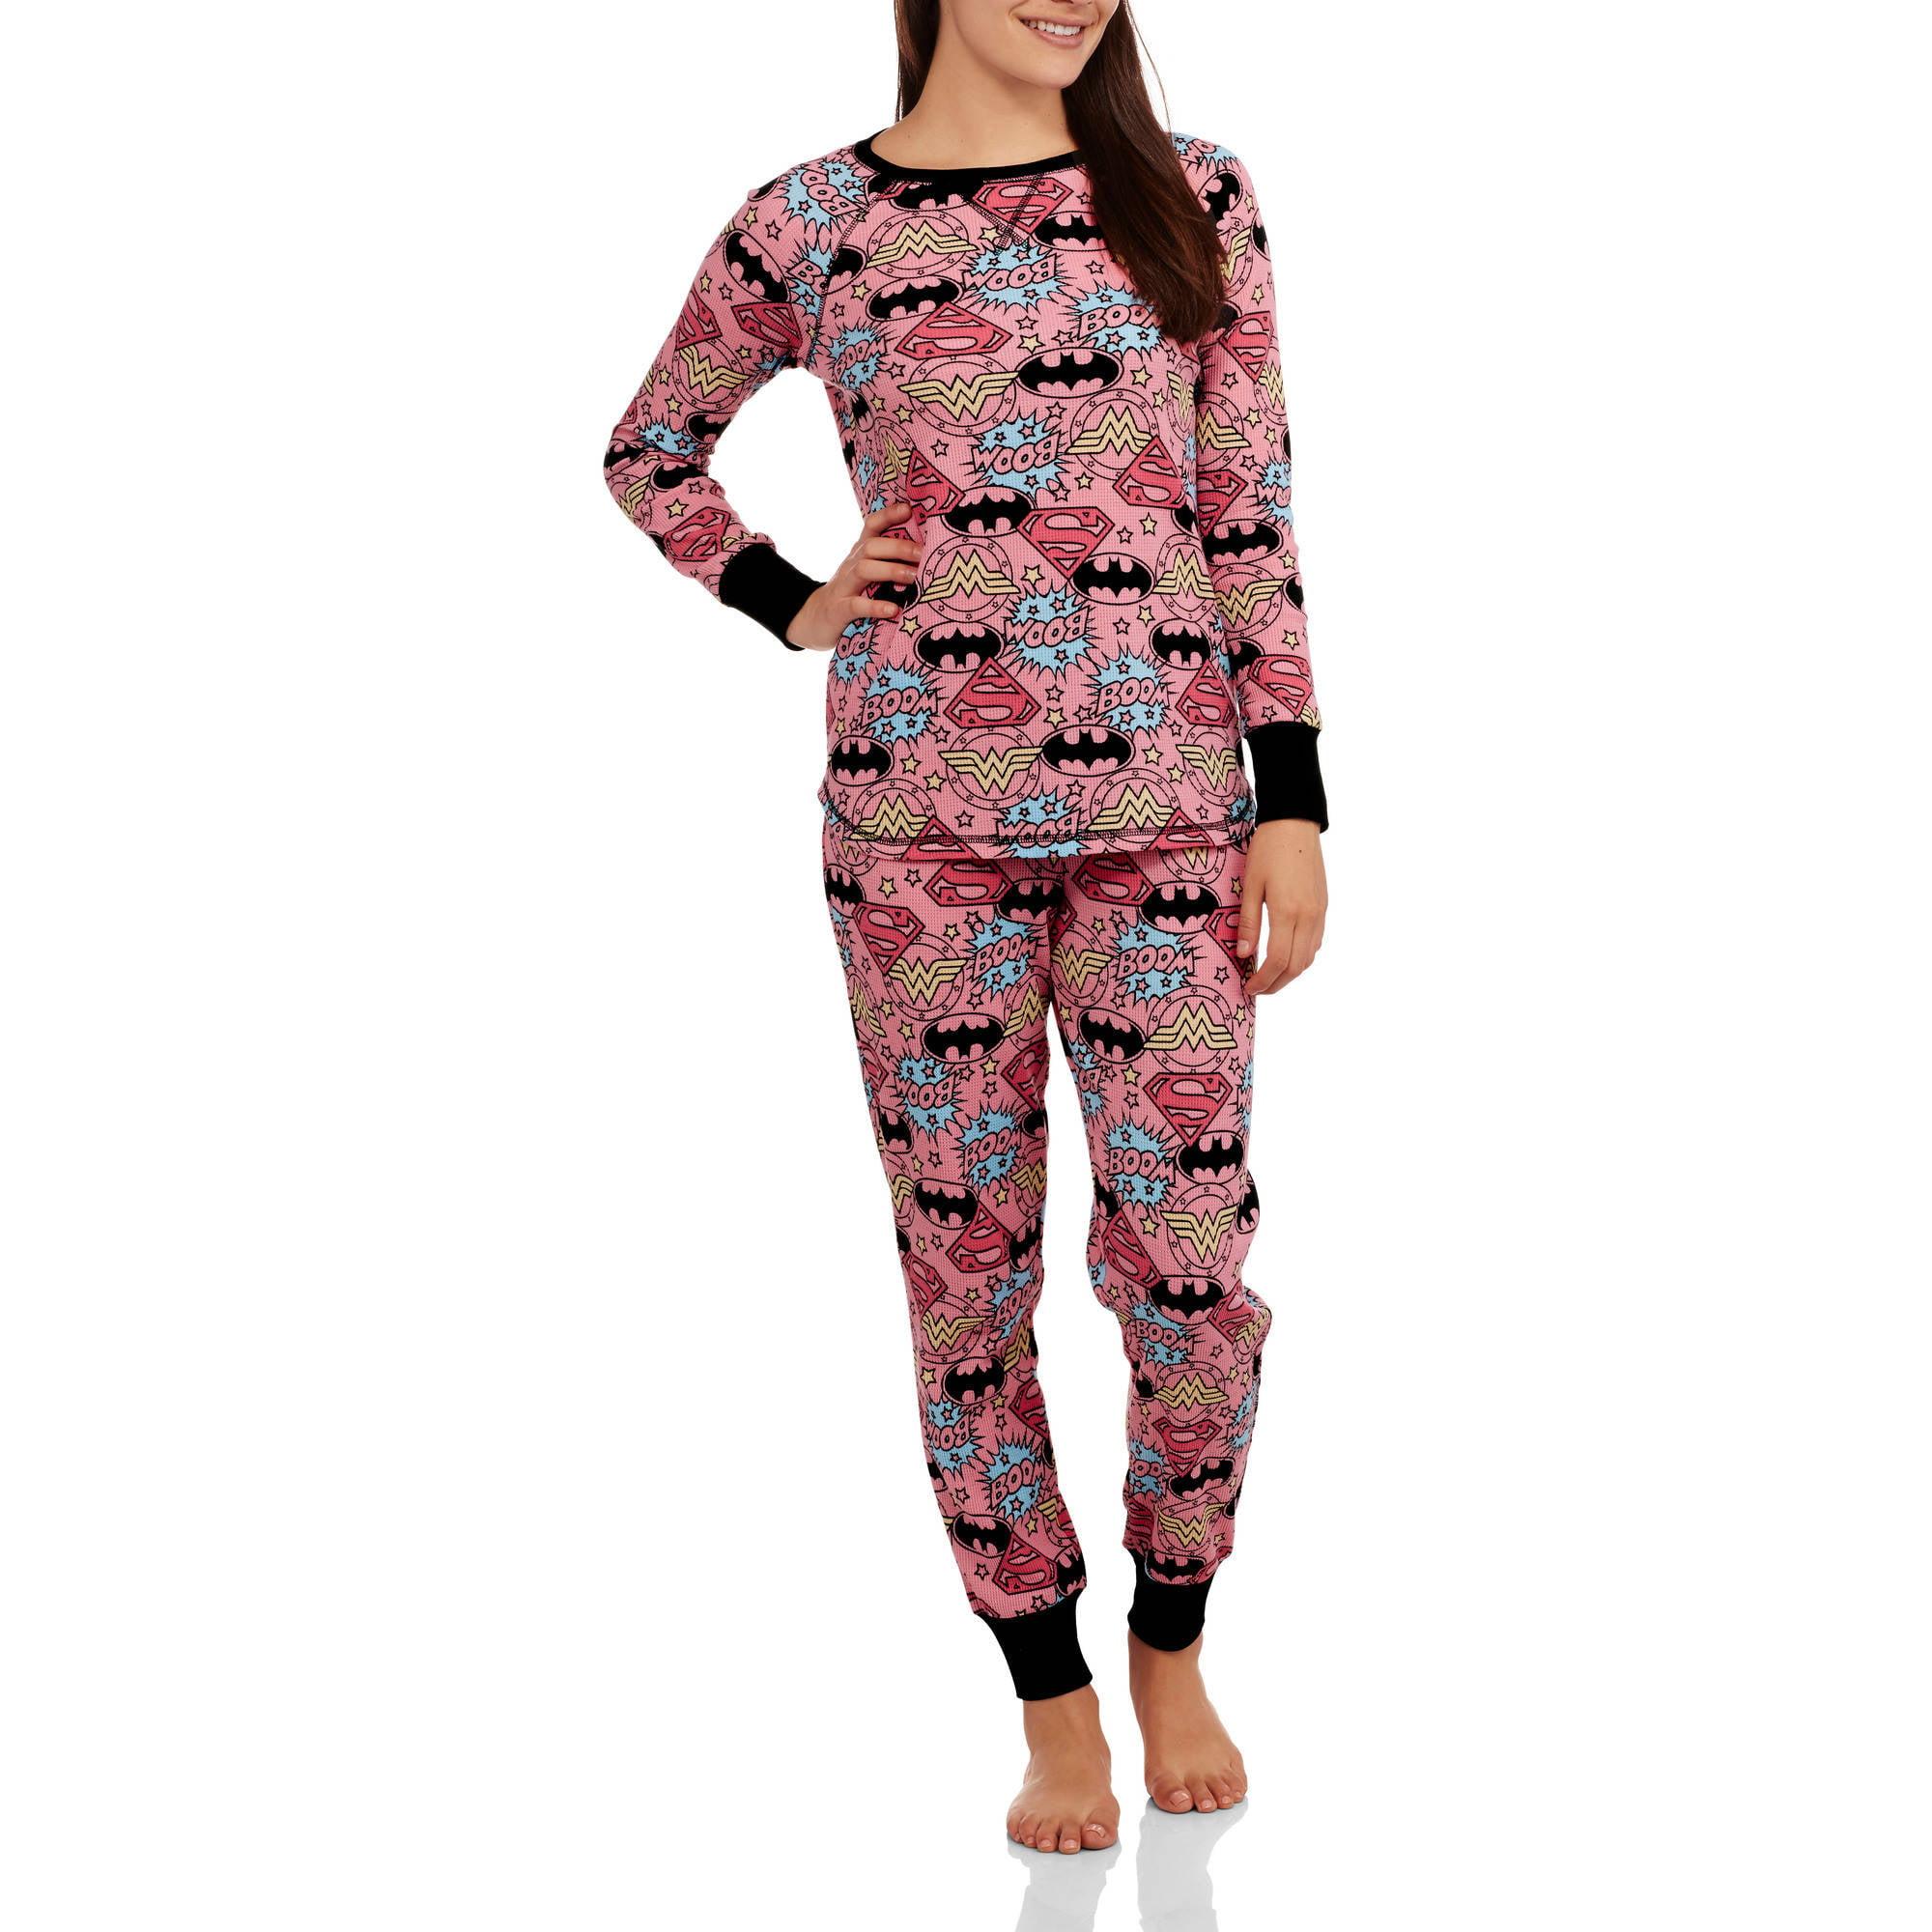 DC Comics Women's License Pajama Thermal Sleep Top and Pant 2 Piece Sleepwear Set